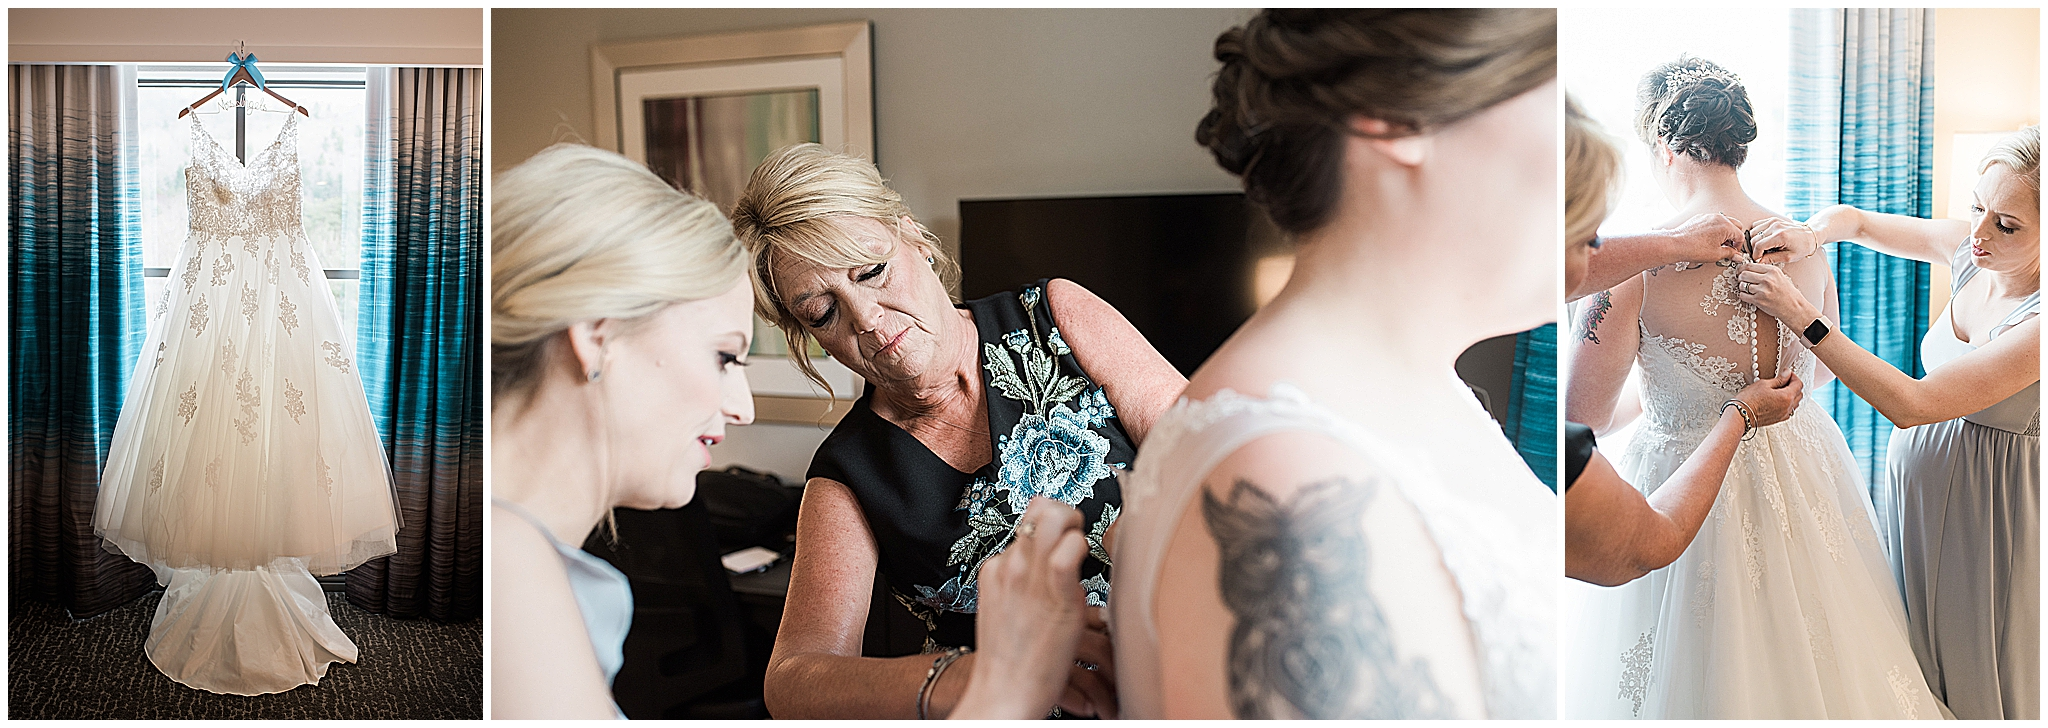 Wedding_Photographer_Asheville_Highland_Brewing_0001.jpg